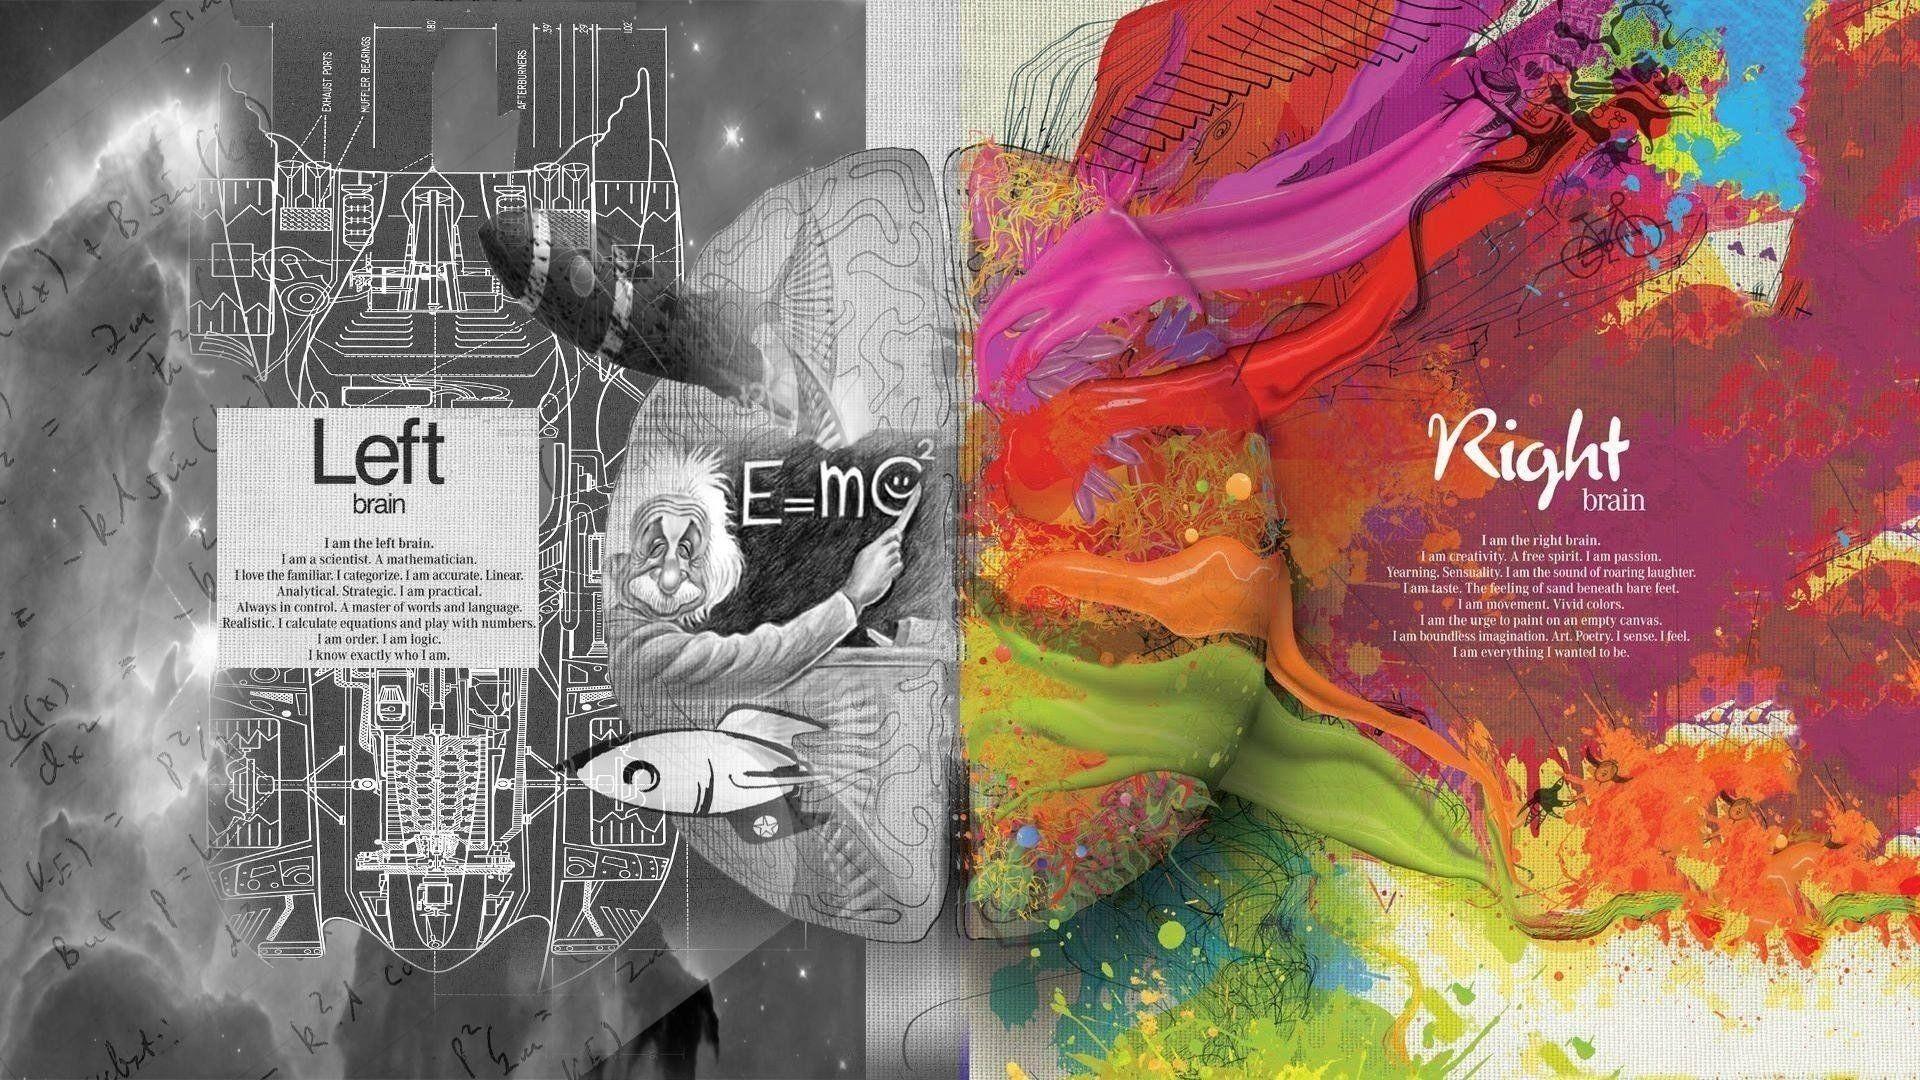 Left Brain Wallpapers Top Free Left Brain Backgrounds